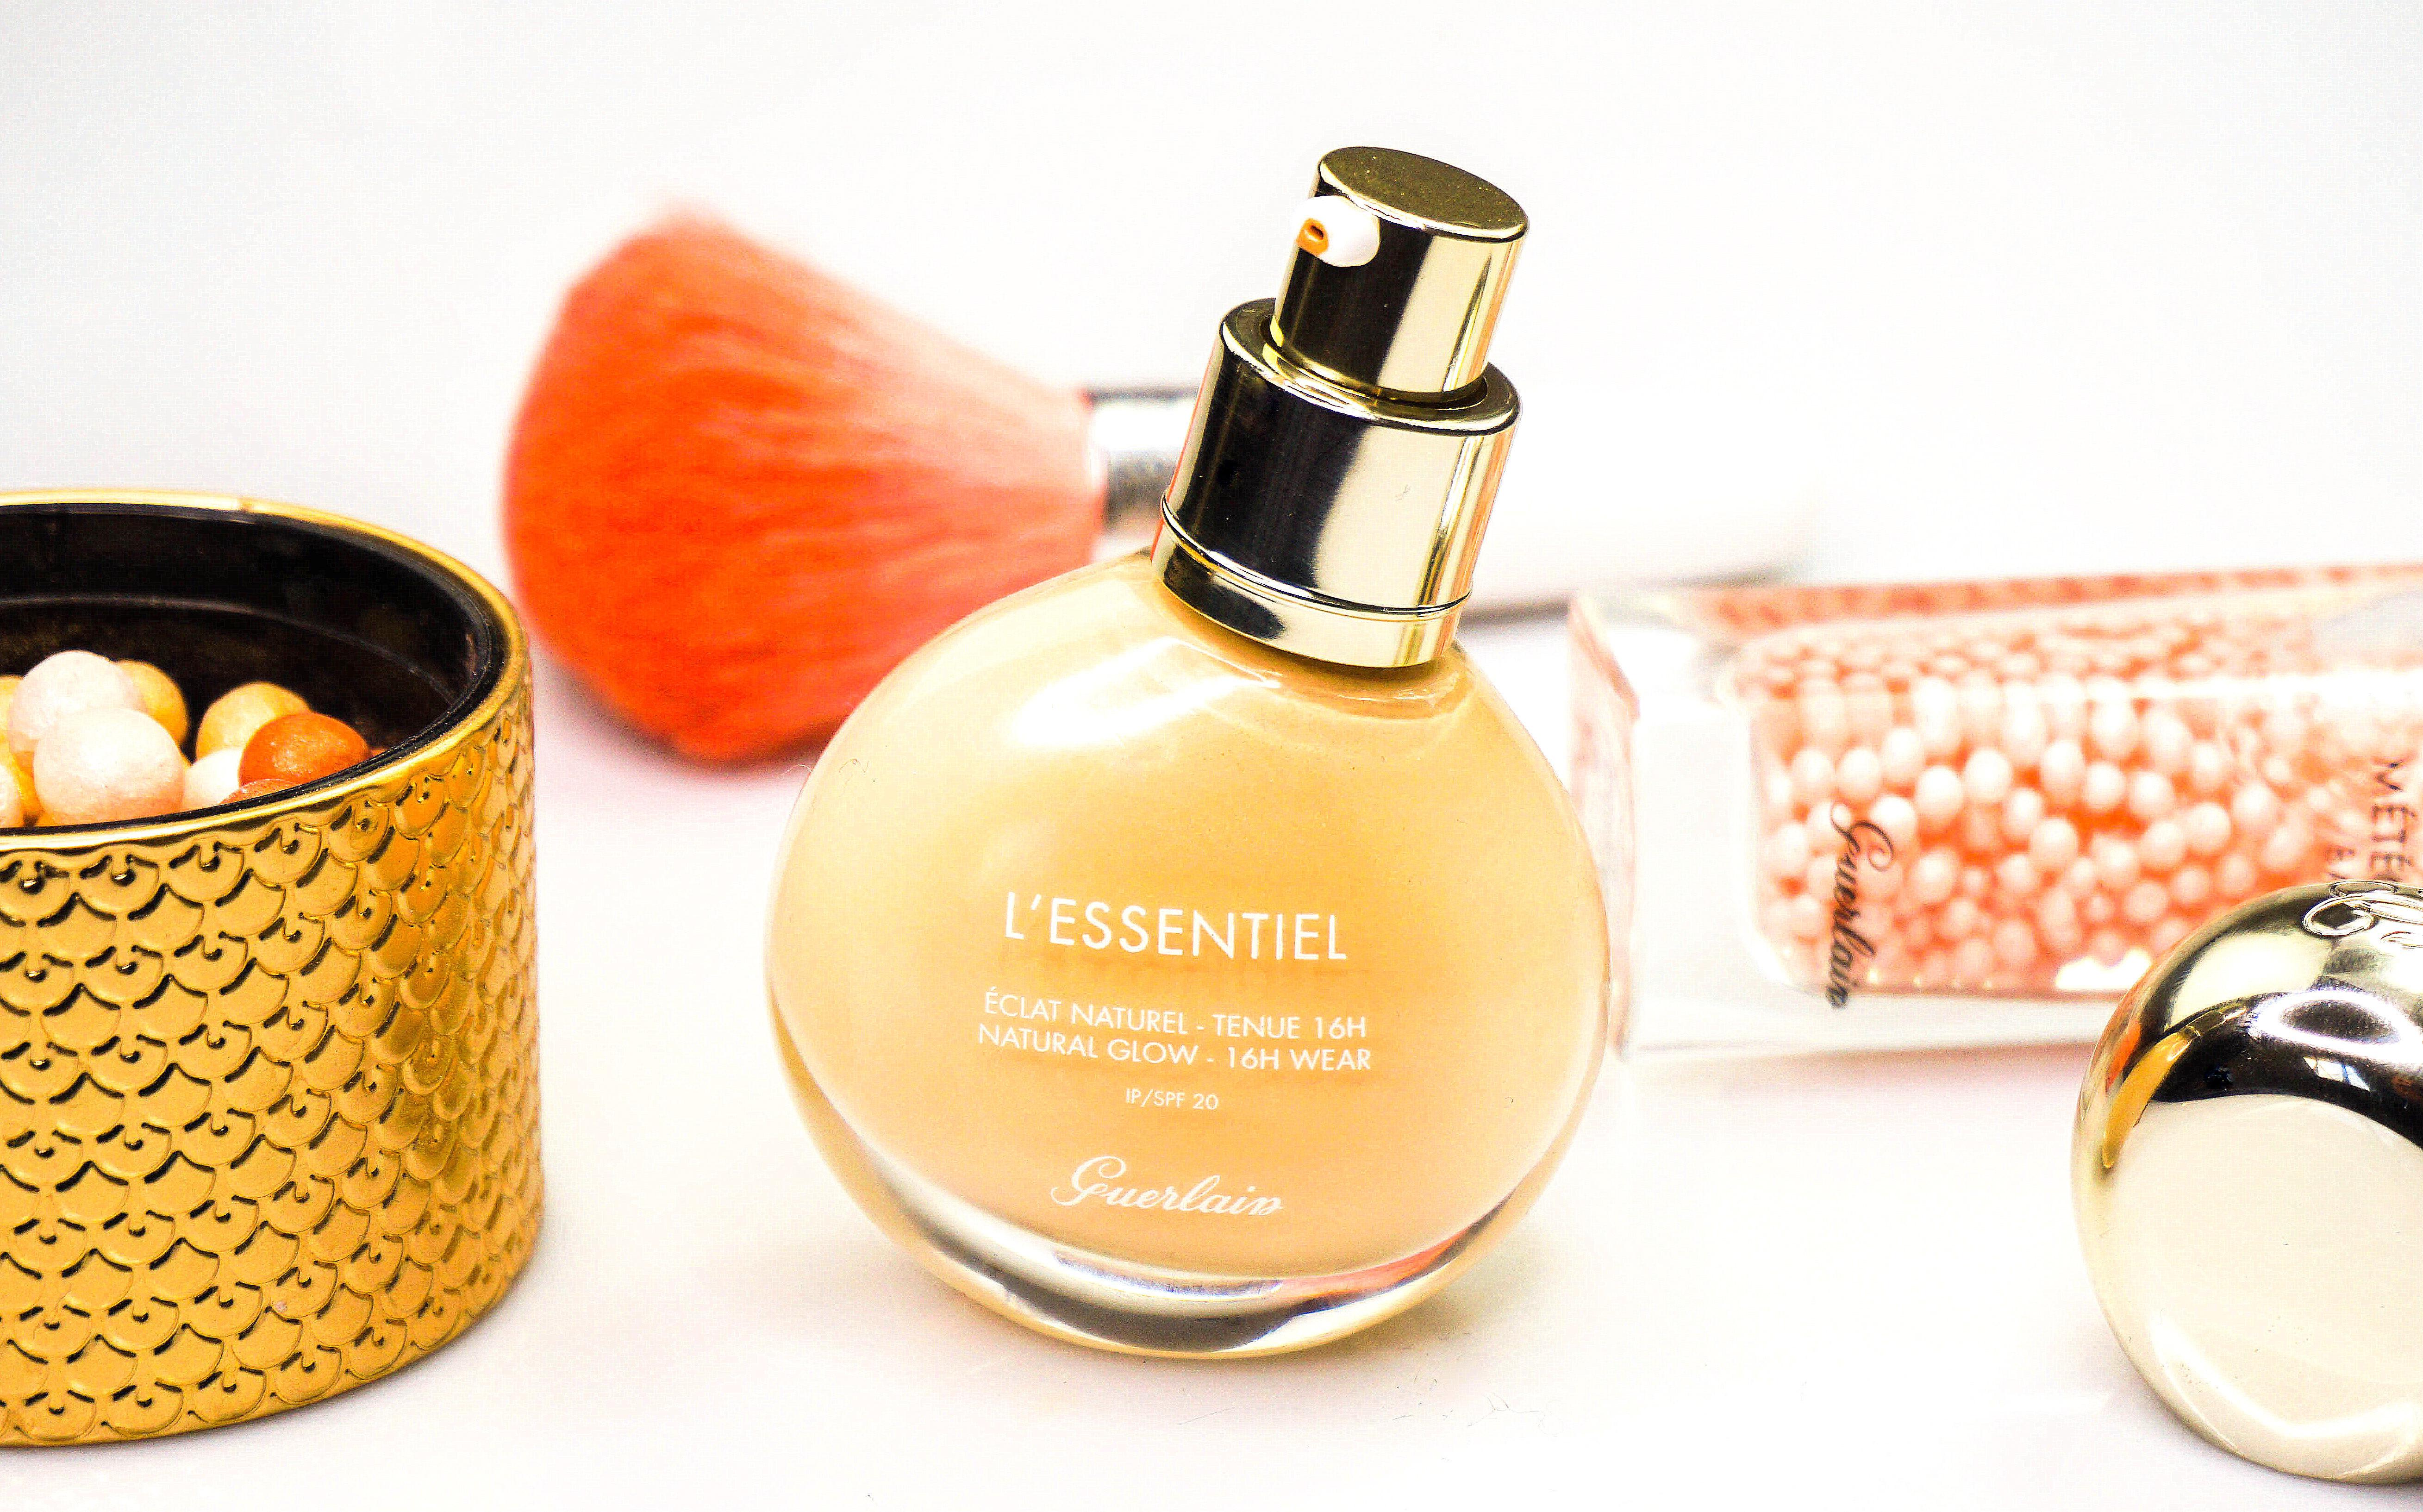 GUERLAIN L'Essentiel Fluid Foundation - Highendlove